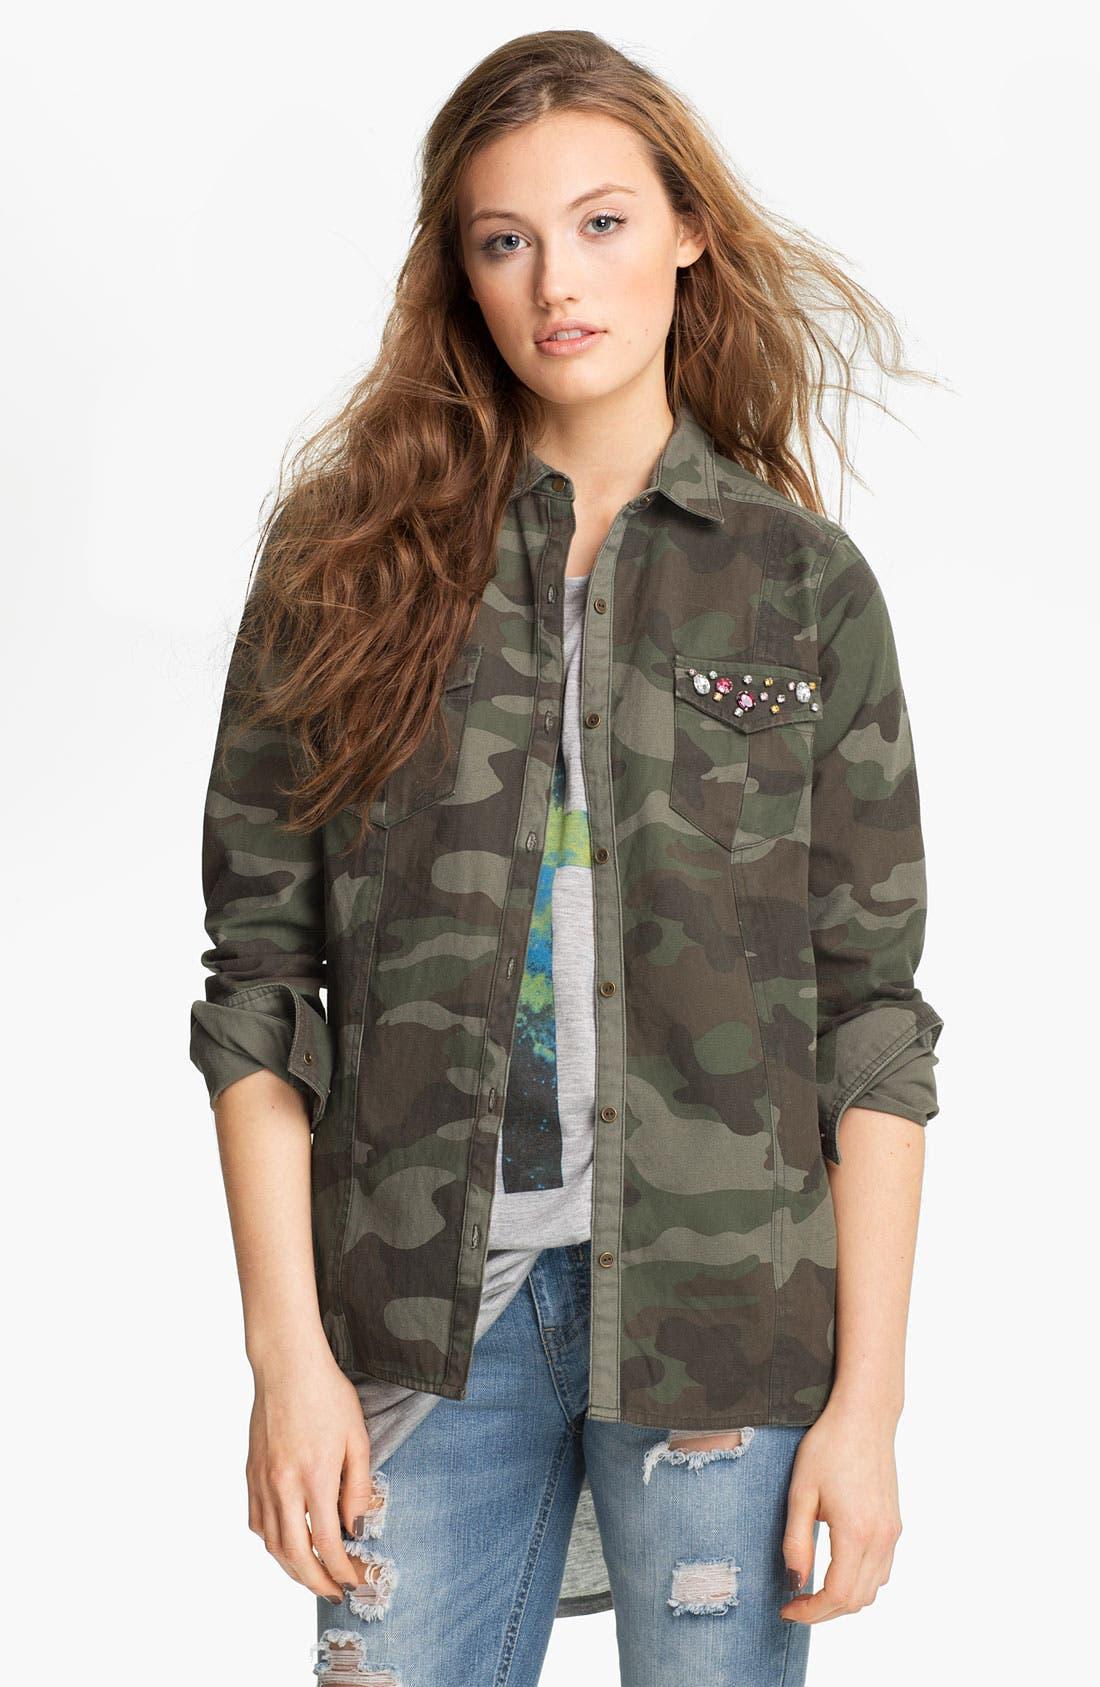 Alternate Image 1 Selected - Elodie Embellished Army Jacket (Juniors)